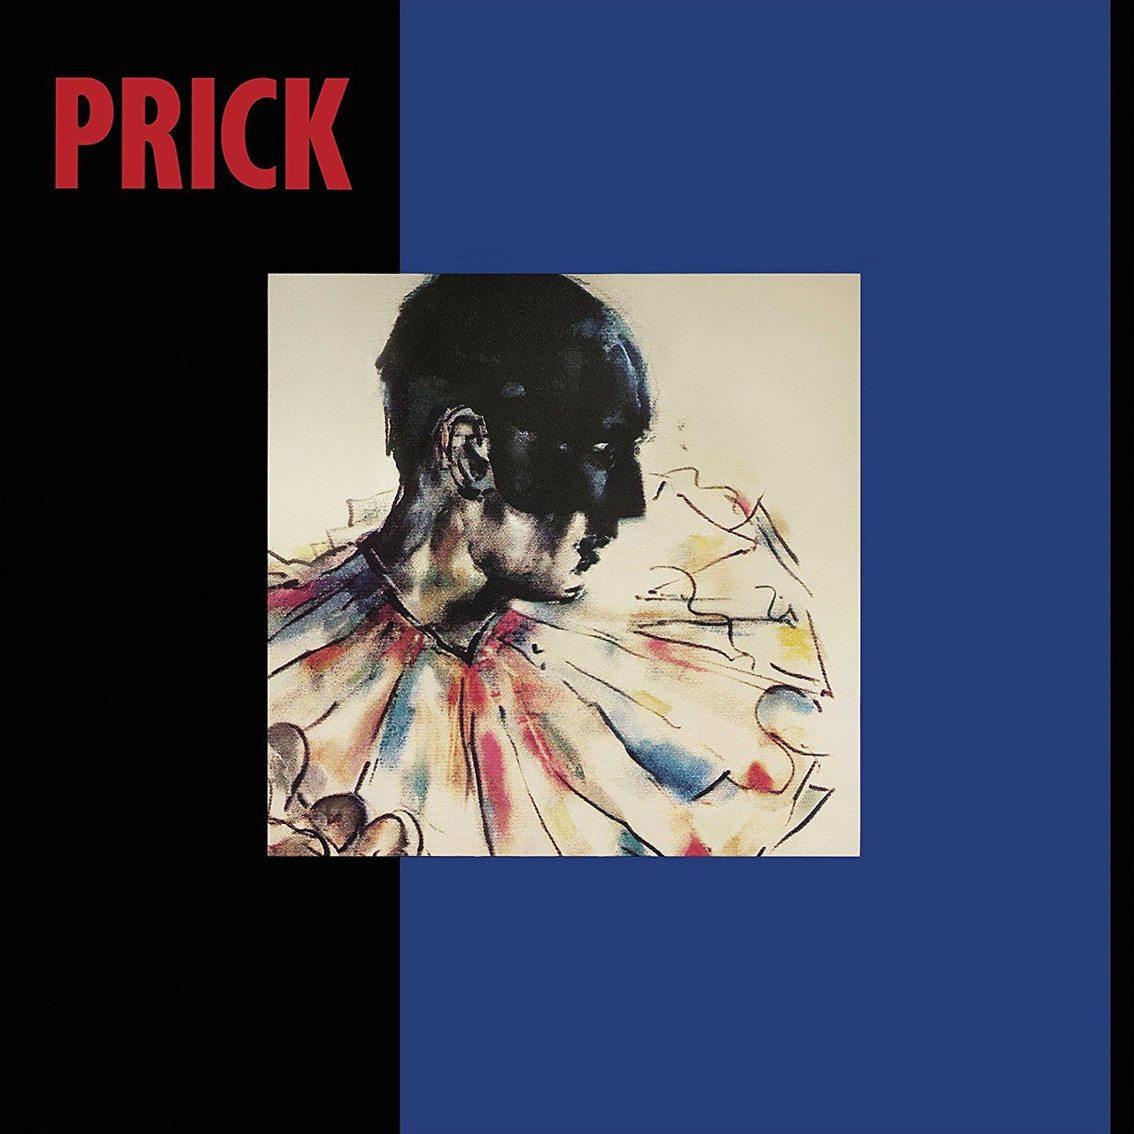 Reissue of Trent Reznor protégé Prick's self-titled debut album on vinyl available now